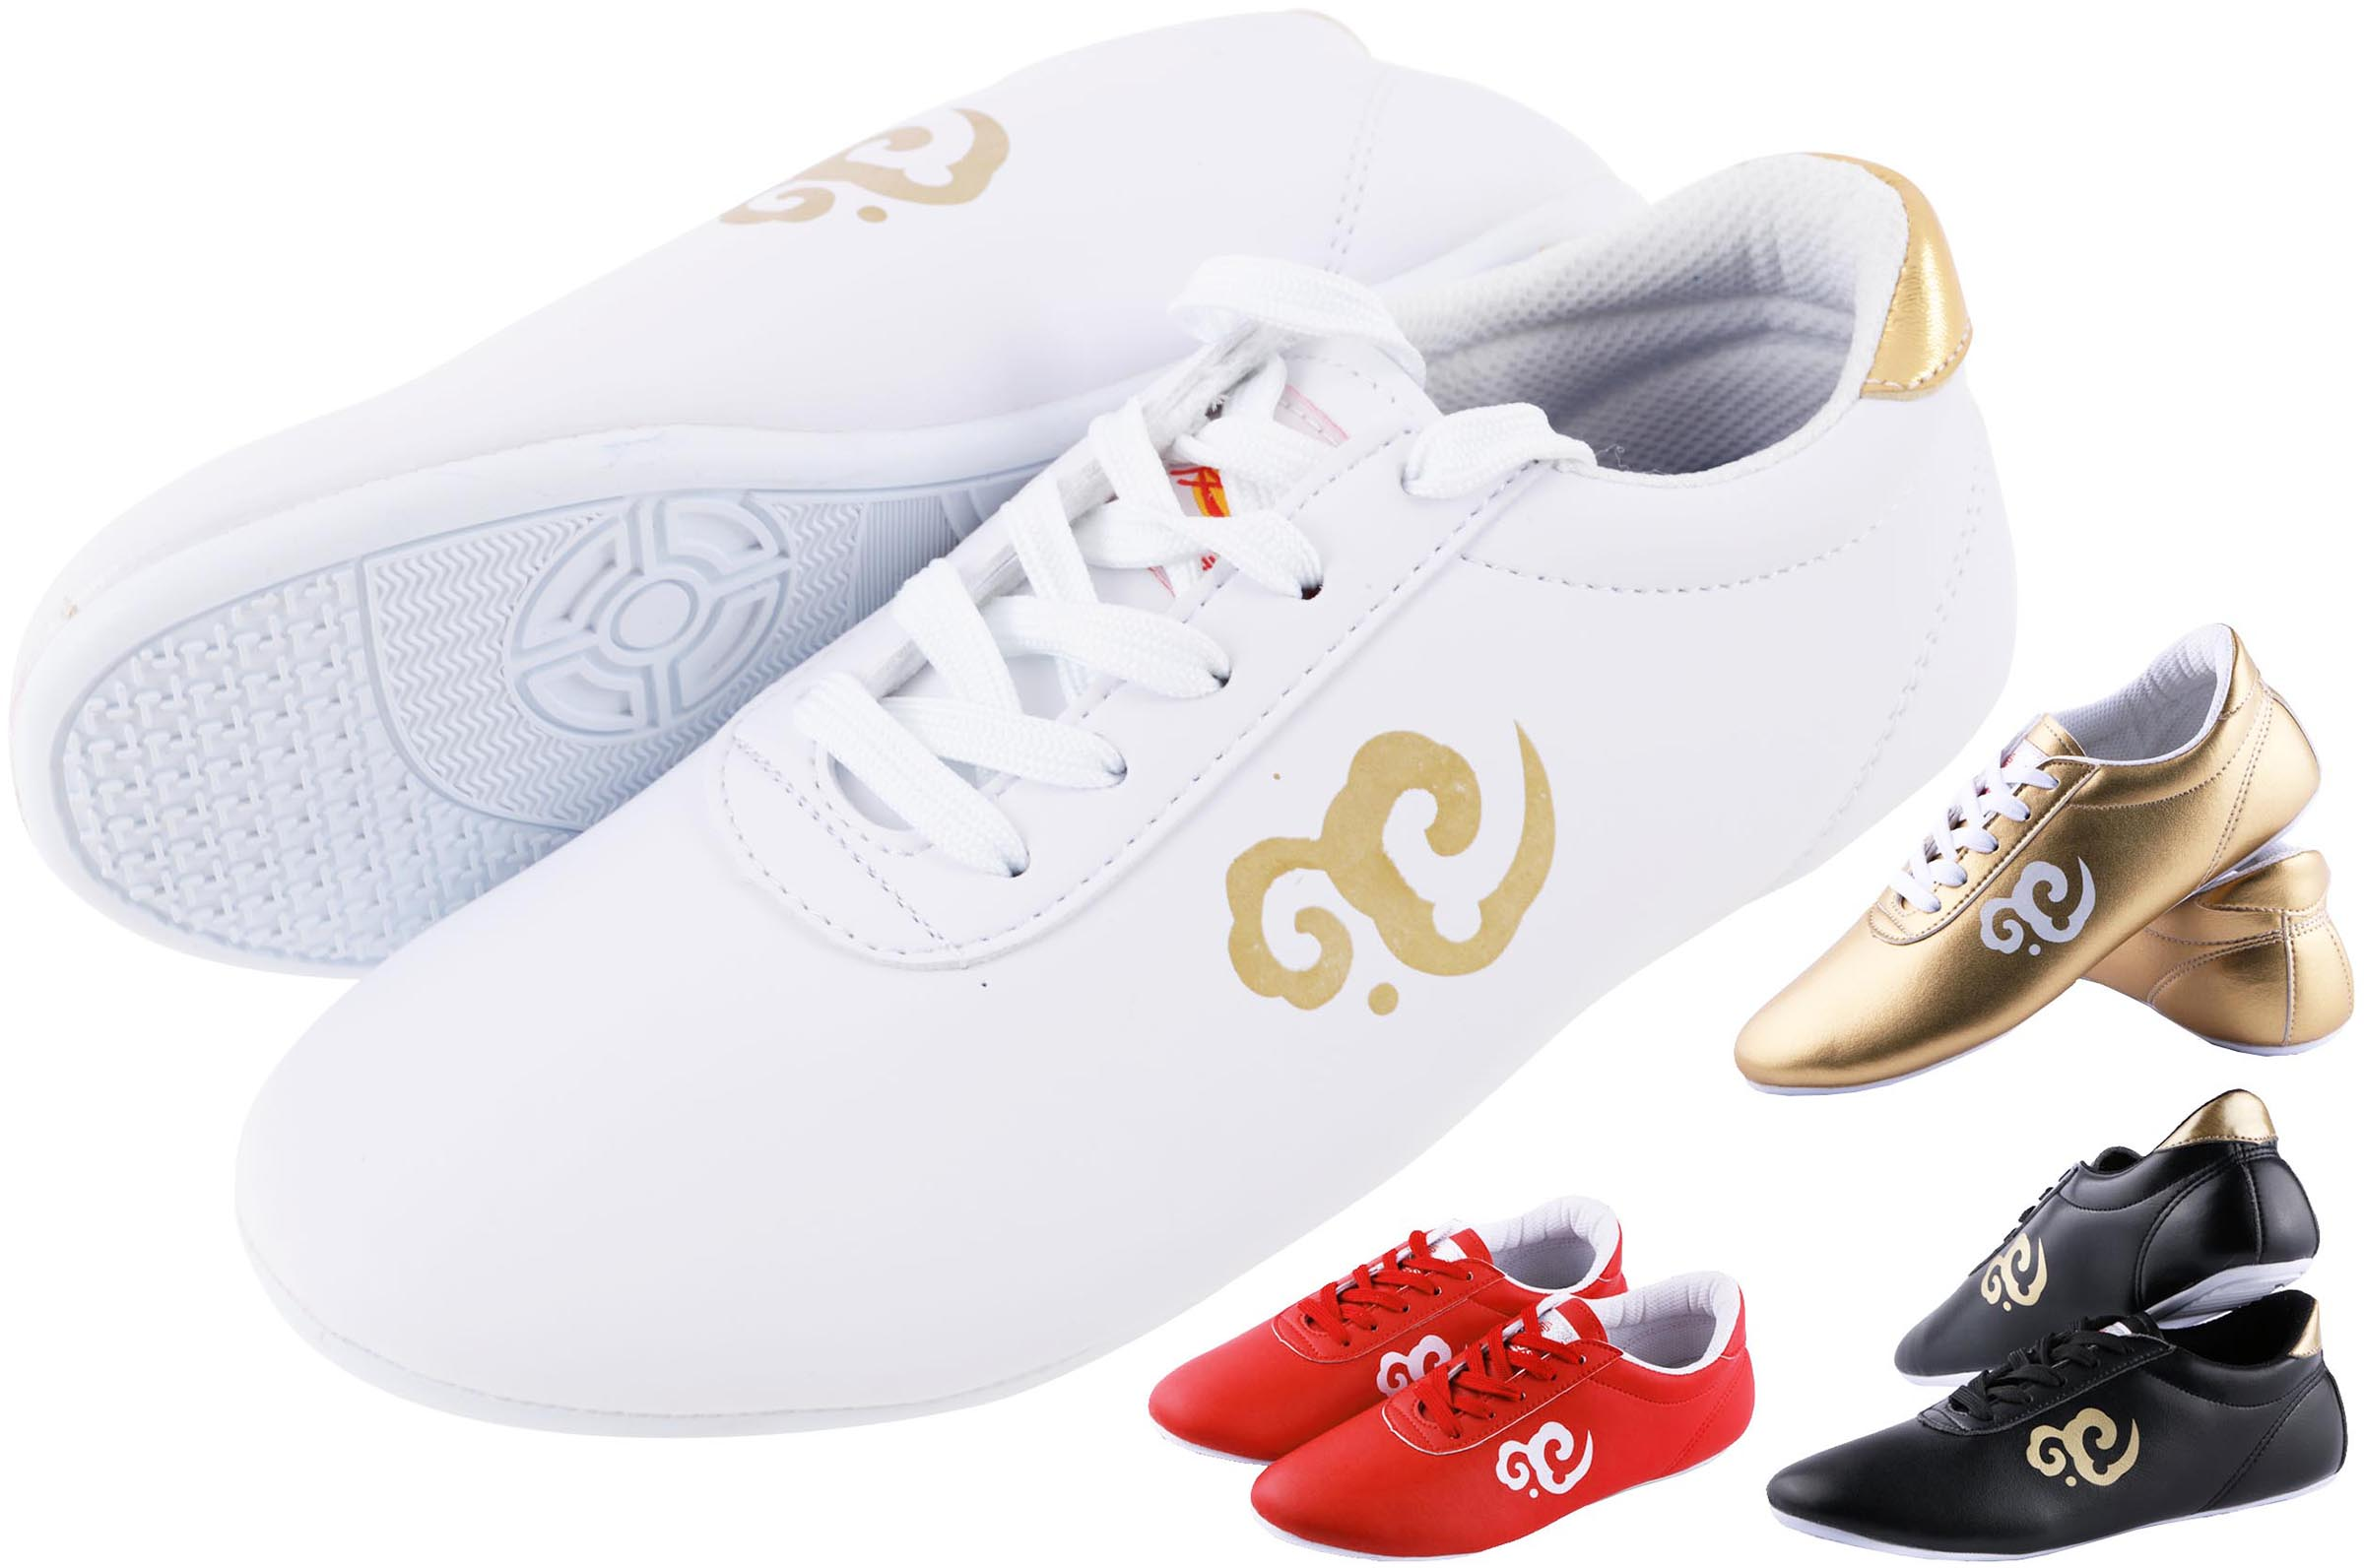 Chaussures Wushu Ai Wu 2